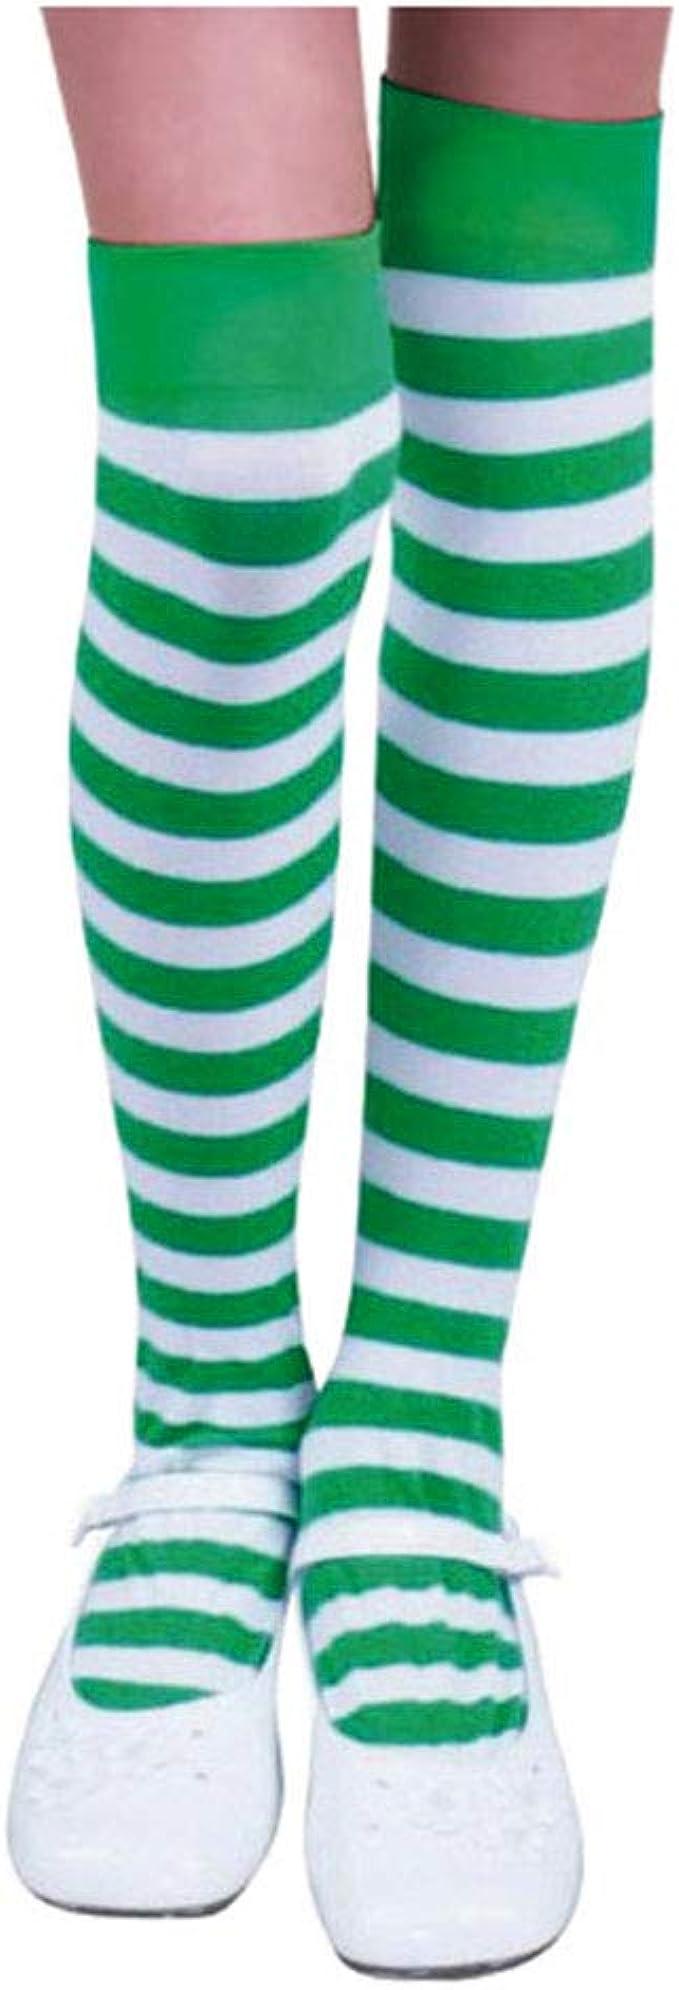 Women Socks Over Knee Irish American Flag Winter Warmth Designer For Halloween